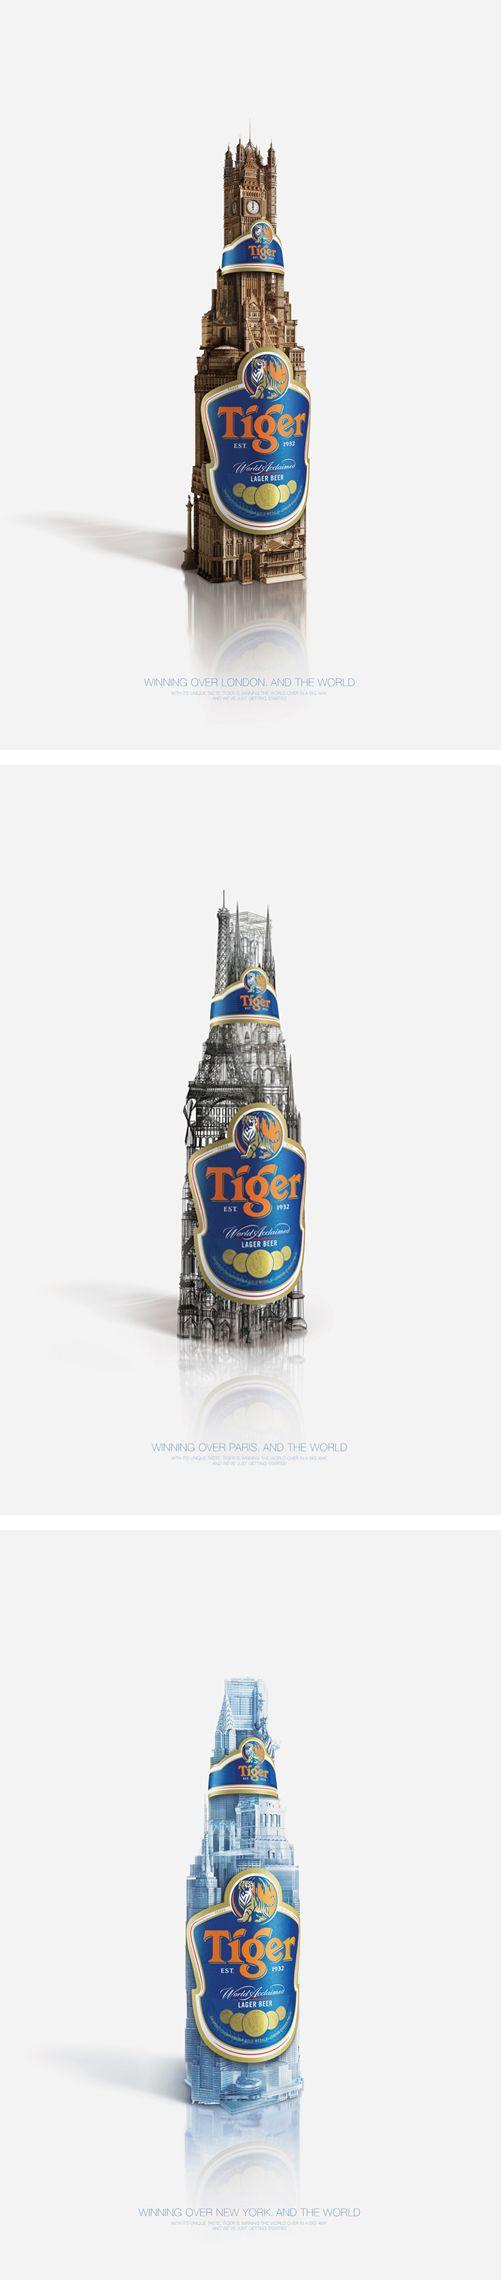 Tiger Beer Credentials 2009 by Nazly Kasim, via Behance